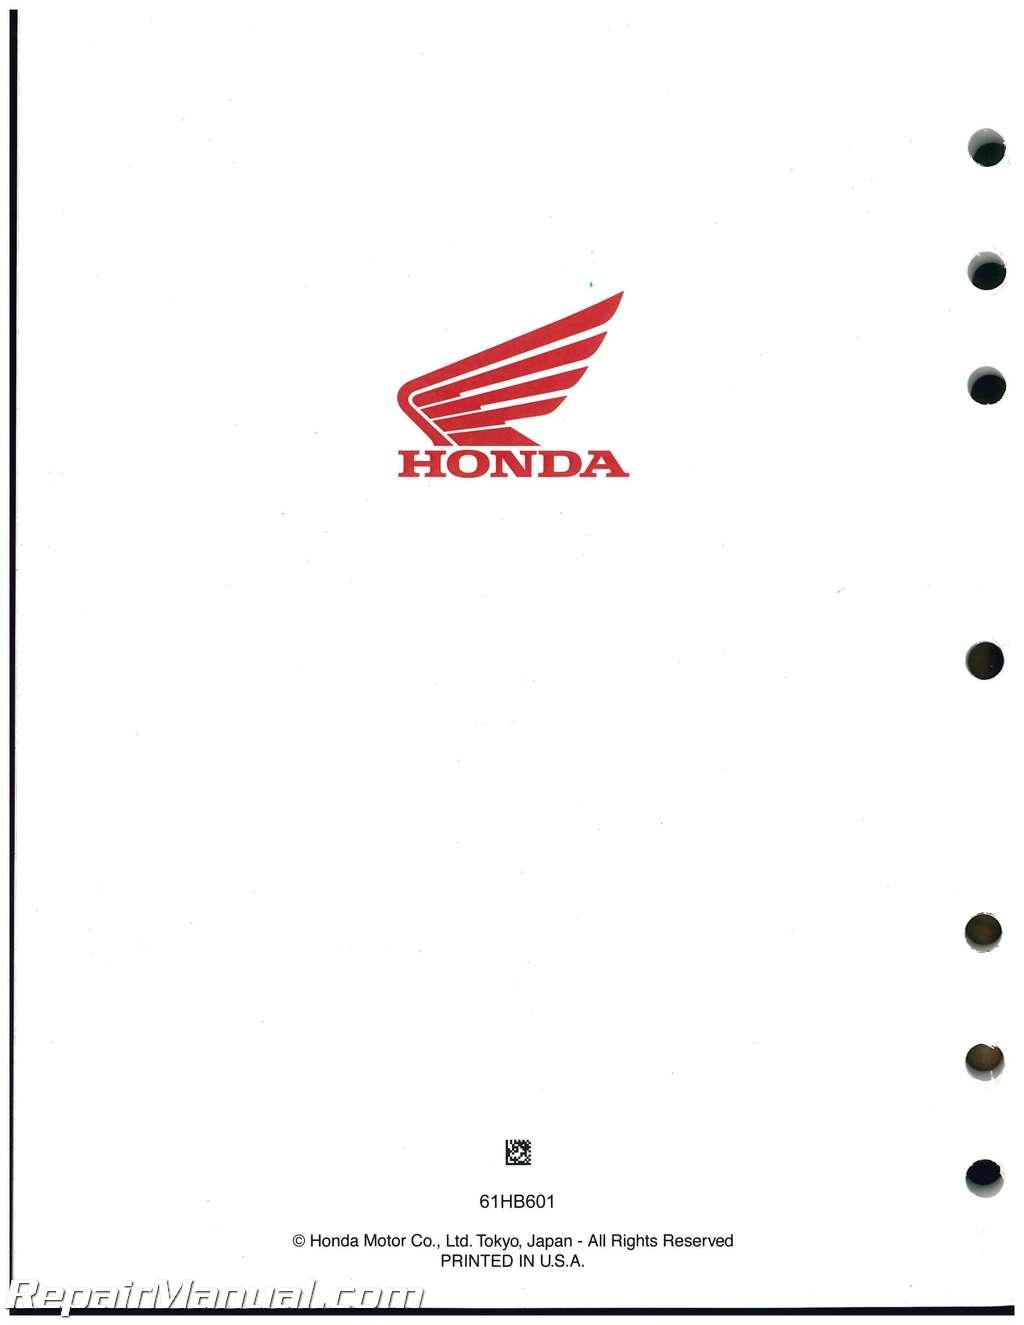 honda fl250 odyssey wiring diagram imageresizertool com rh imageresizertool com Honda Odyssey ATV Wiring Diagram honda odyssey fl250 wiring diagram